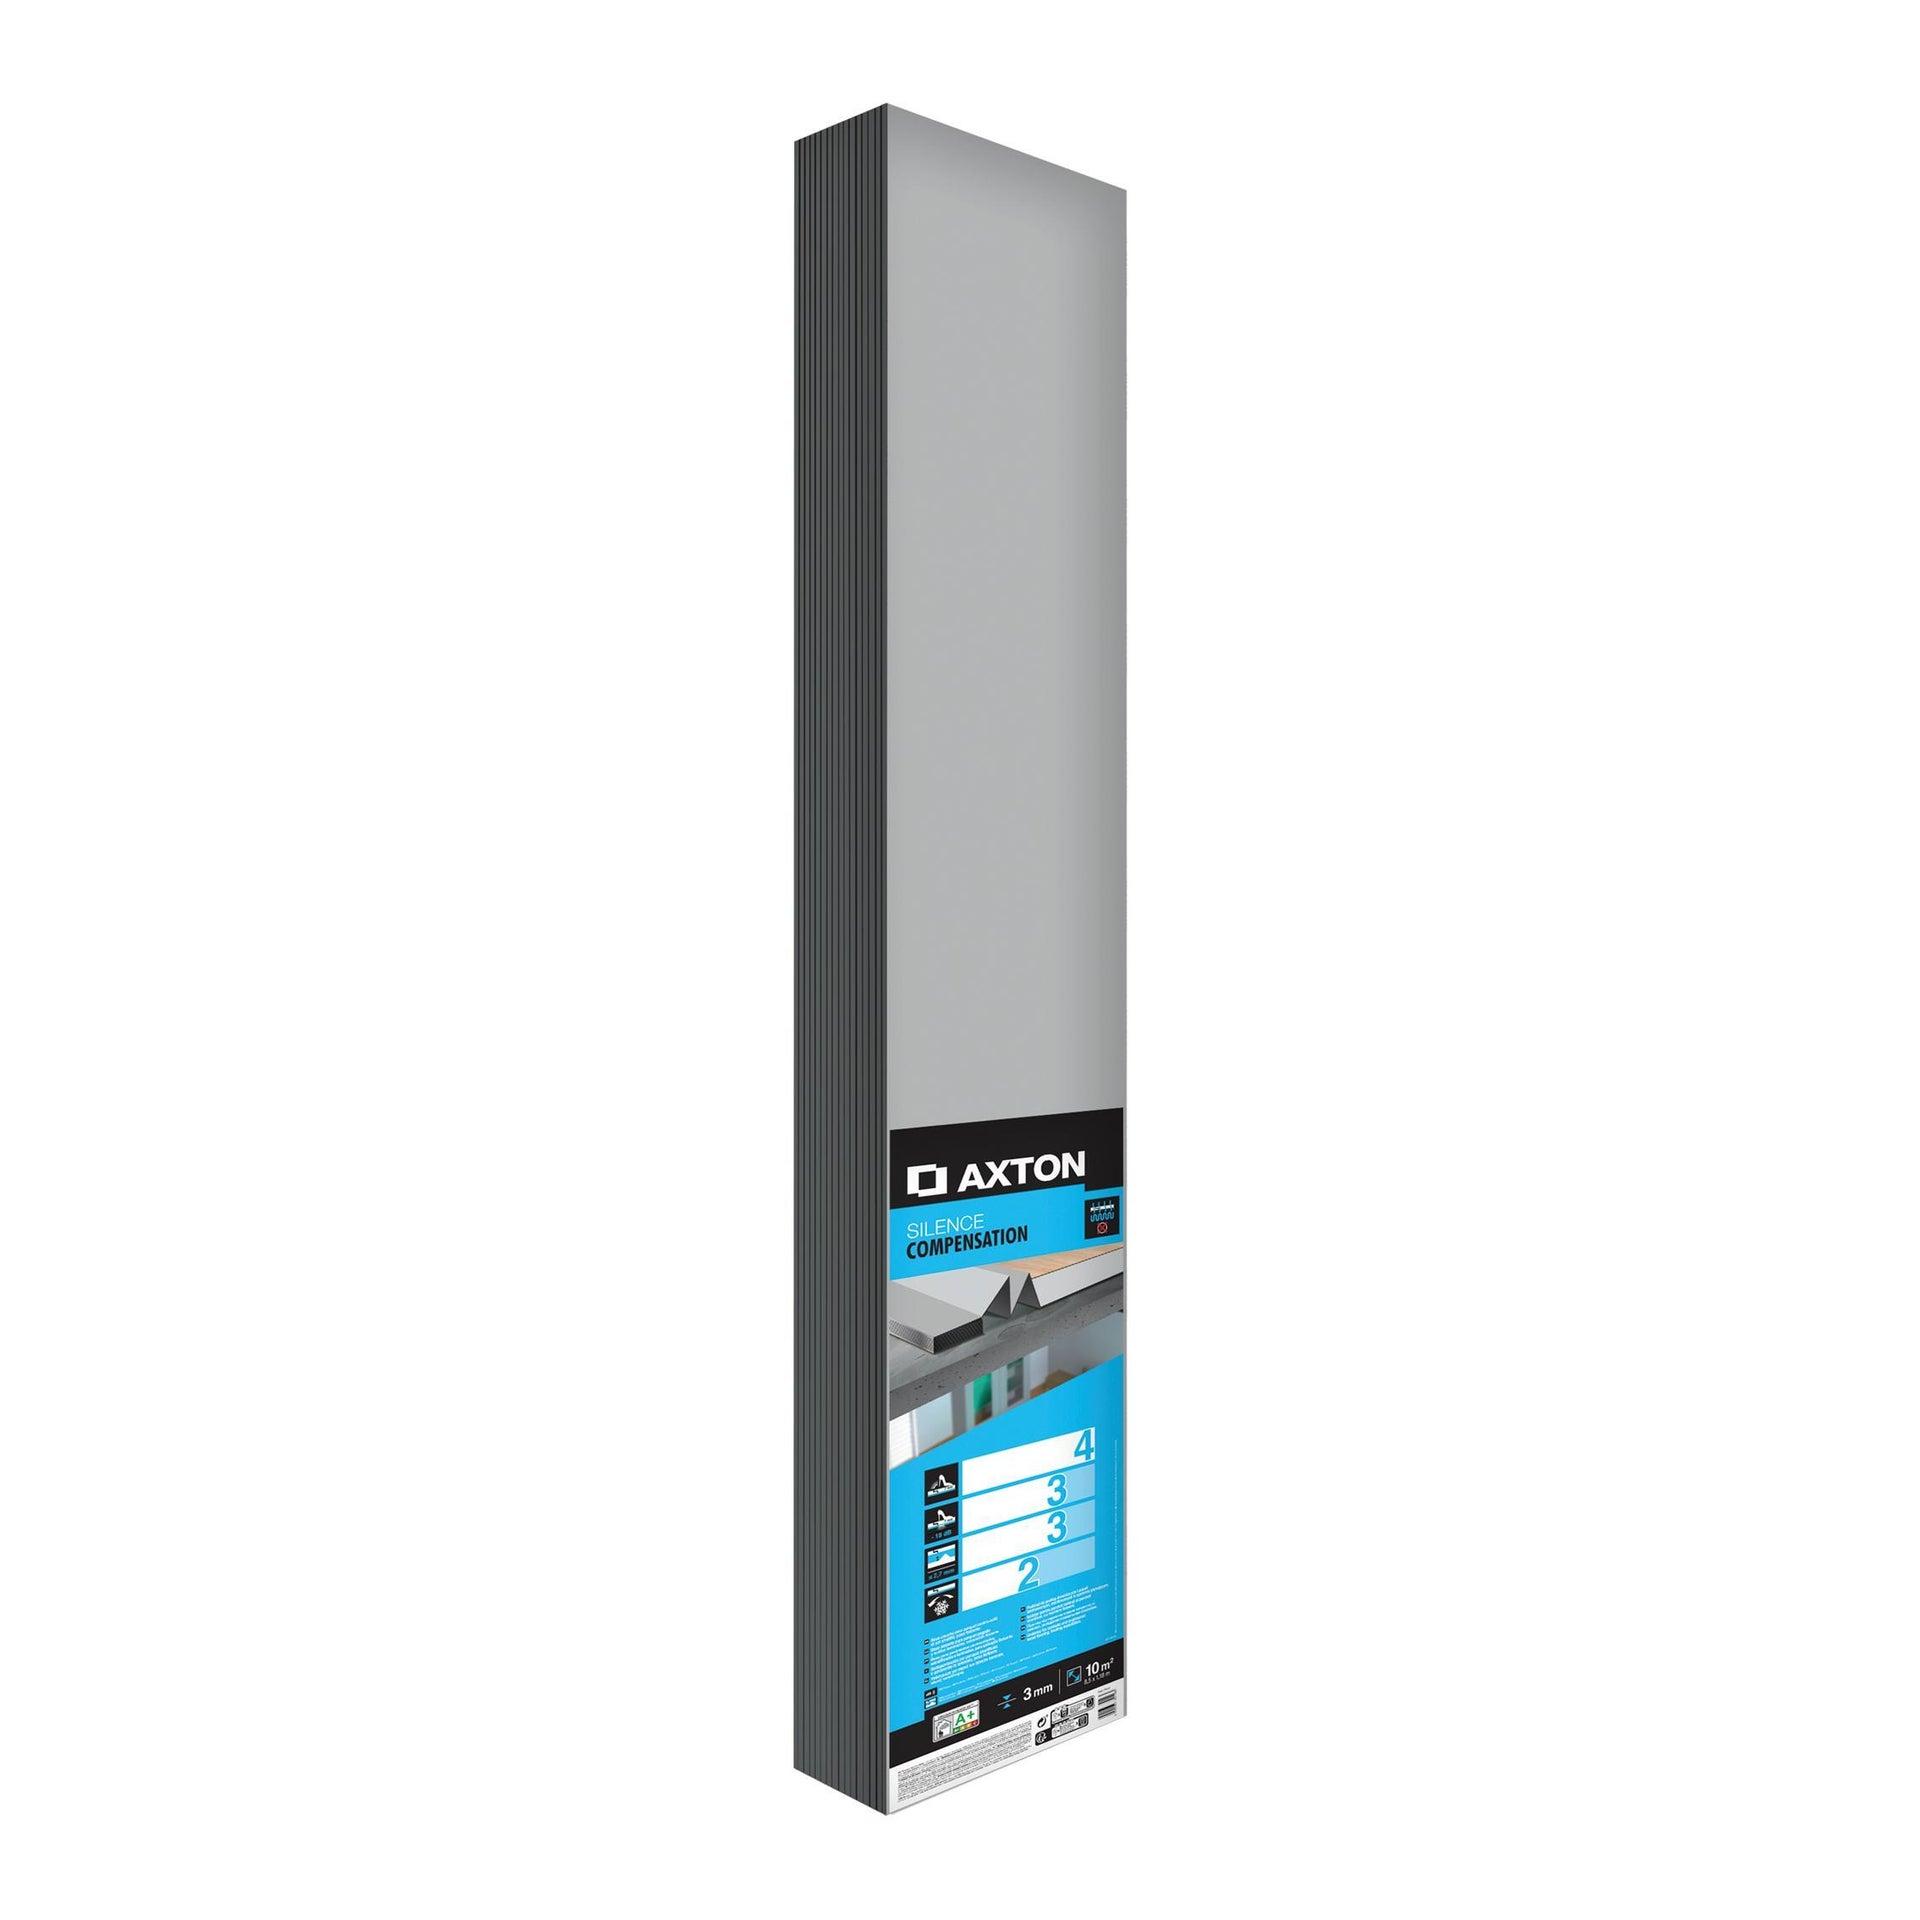 Sottopavimento AXTON Silence Compensation Sp 3 mm - 2